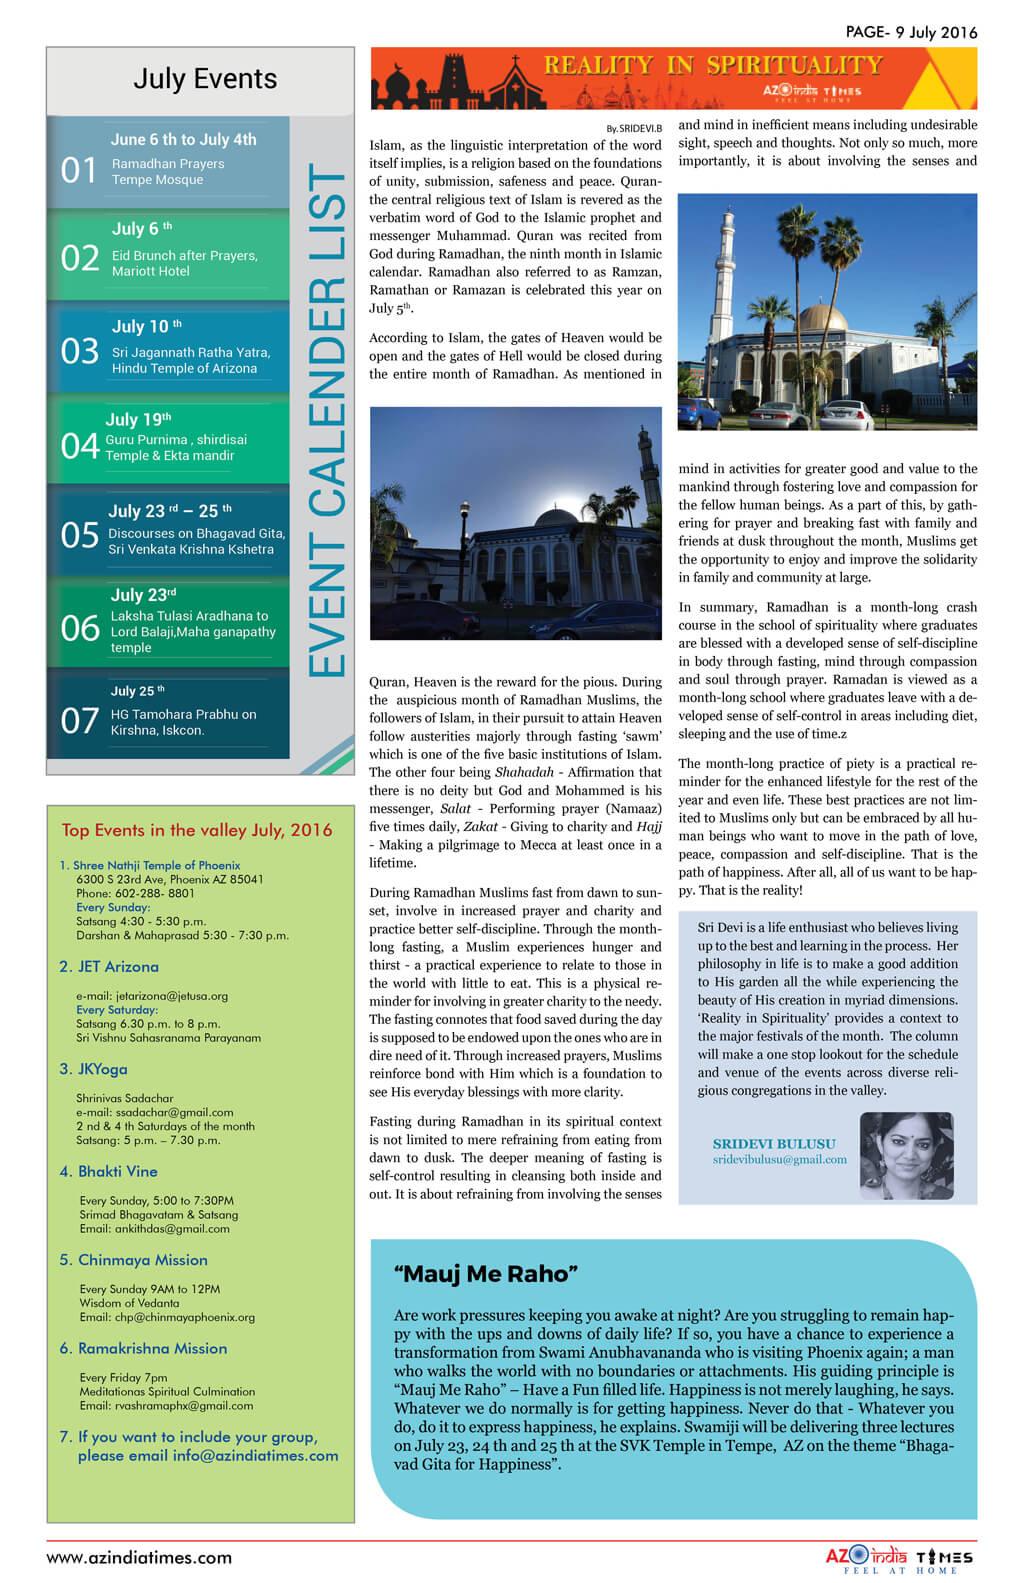 AZ INDIA NEWS PAGE-9